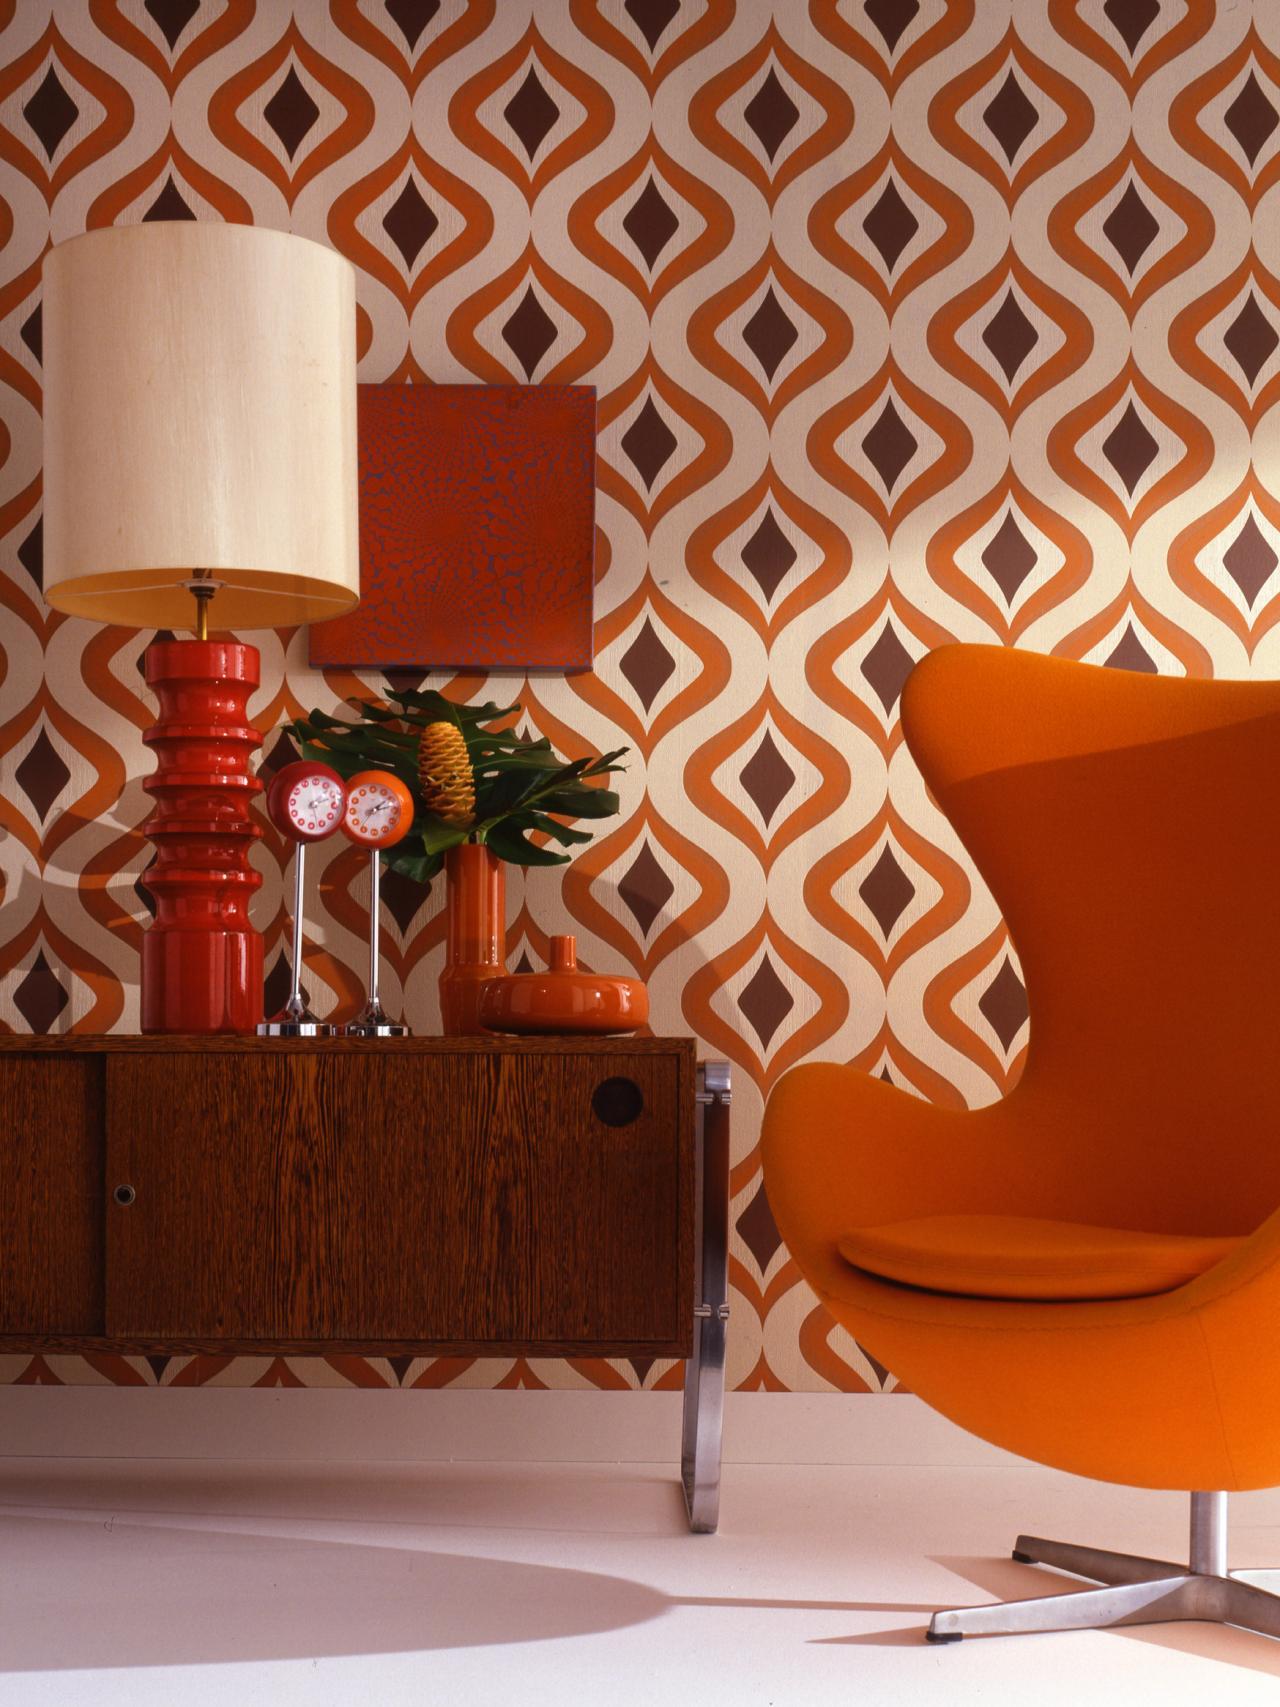 Best Online Sources for Wallpaper Decorating and Design Blog HGTV 1280x1707